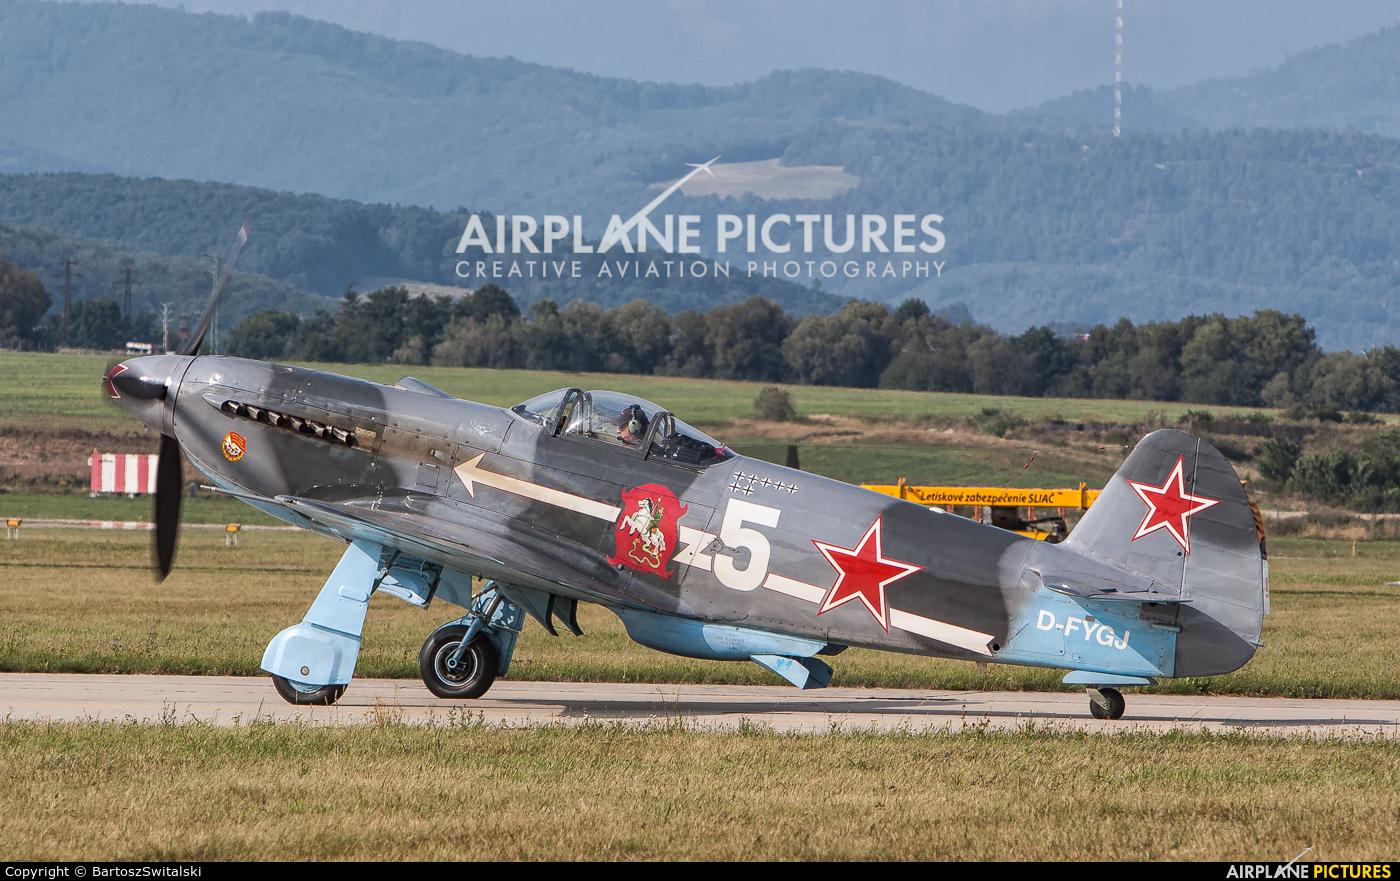 Private D-FYGJ aircraft at Sliač